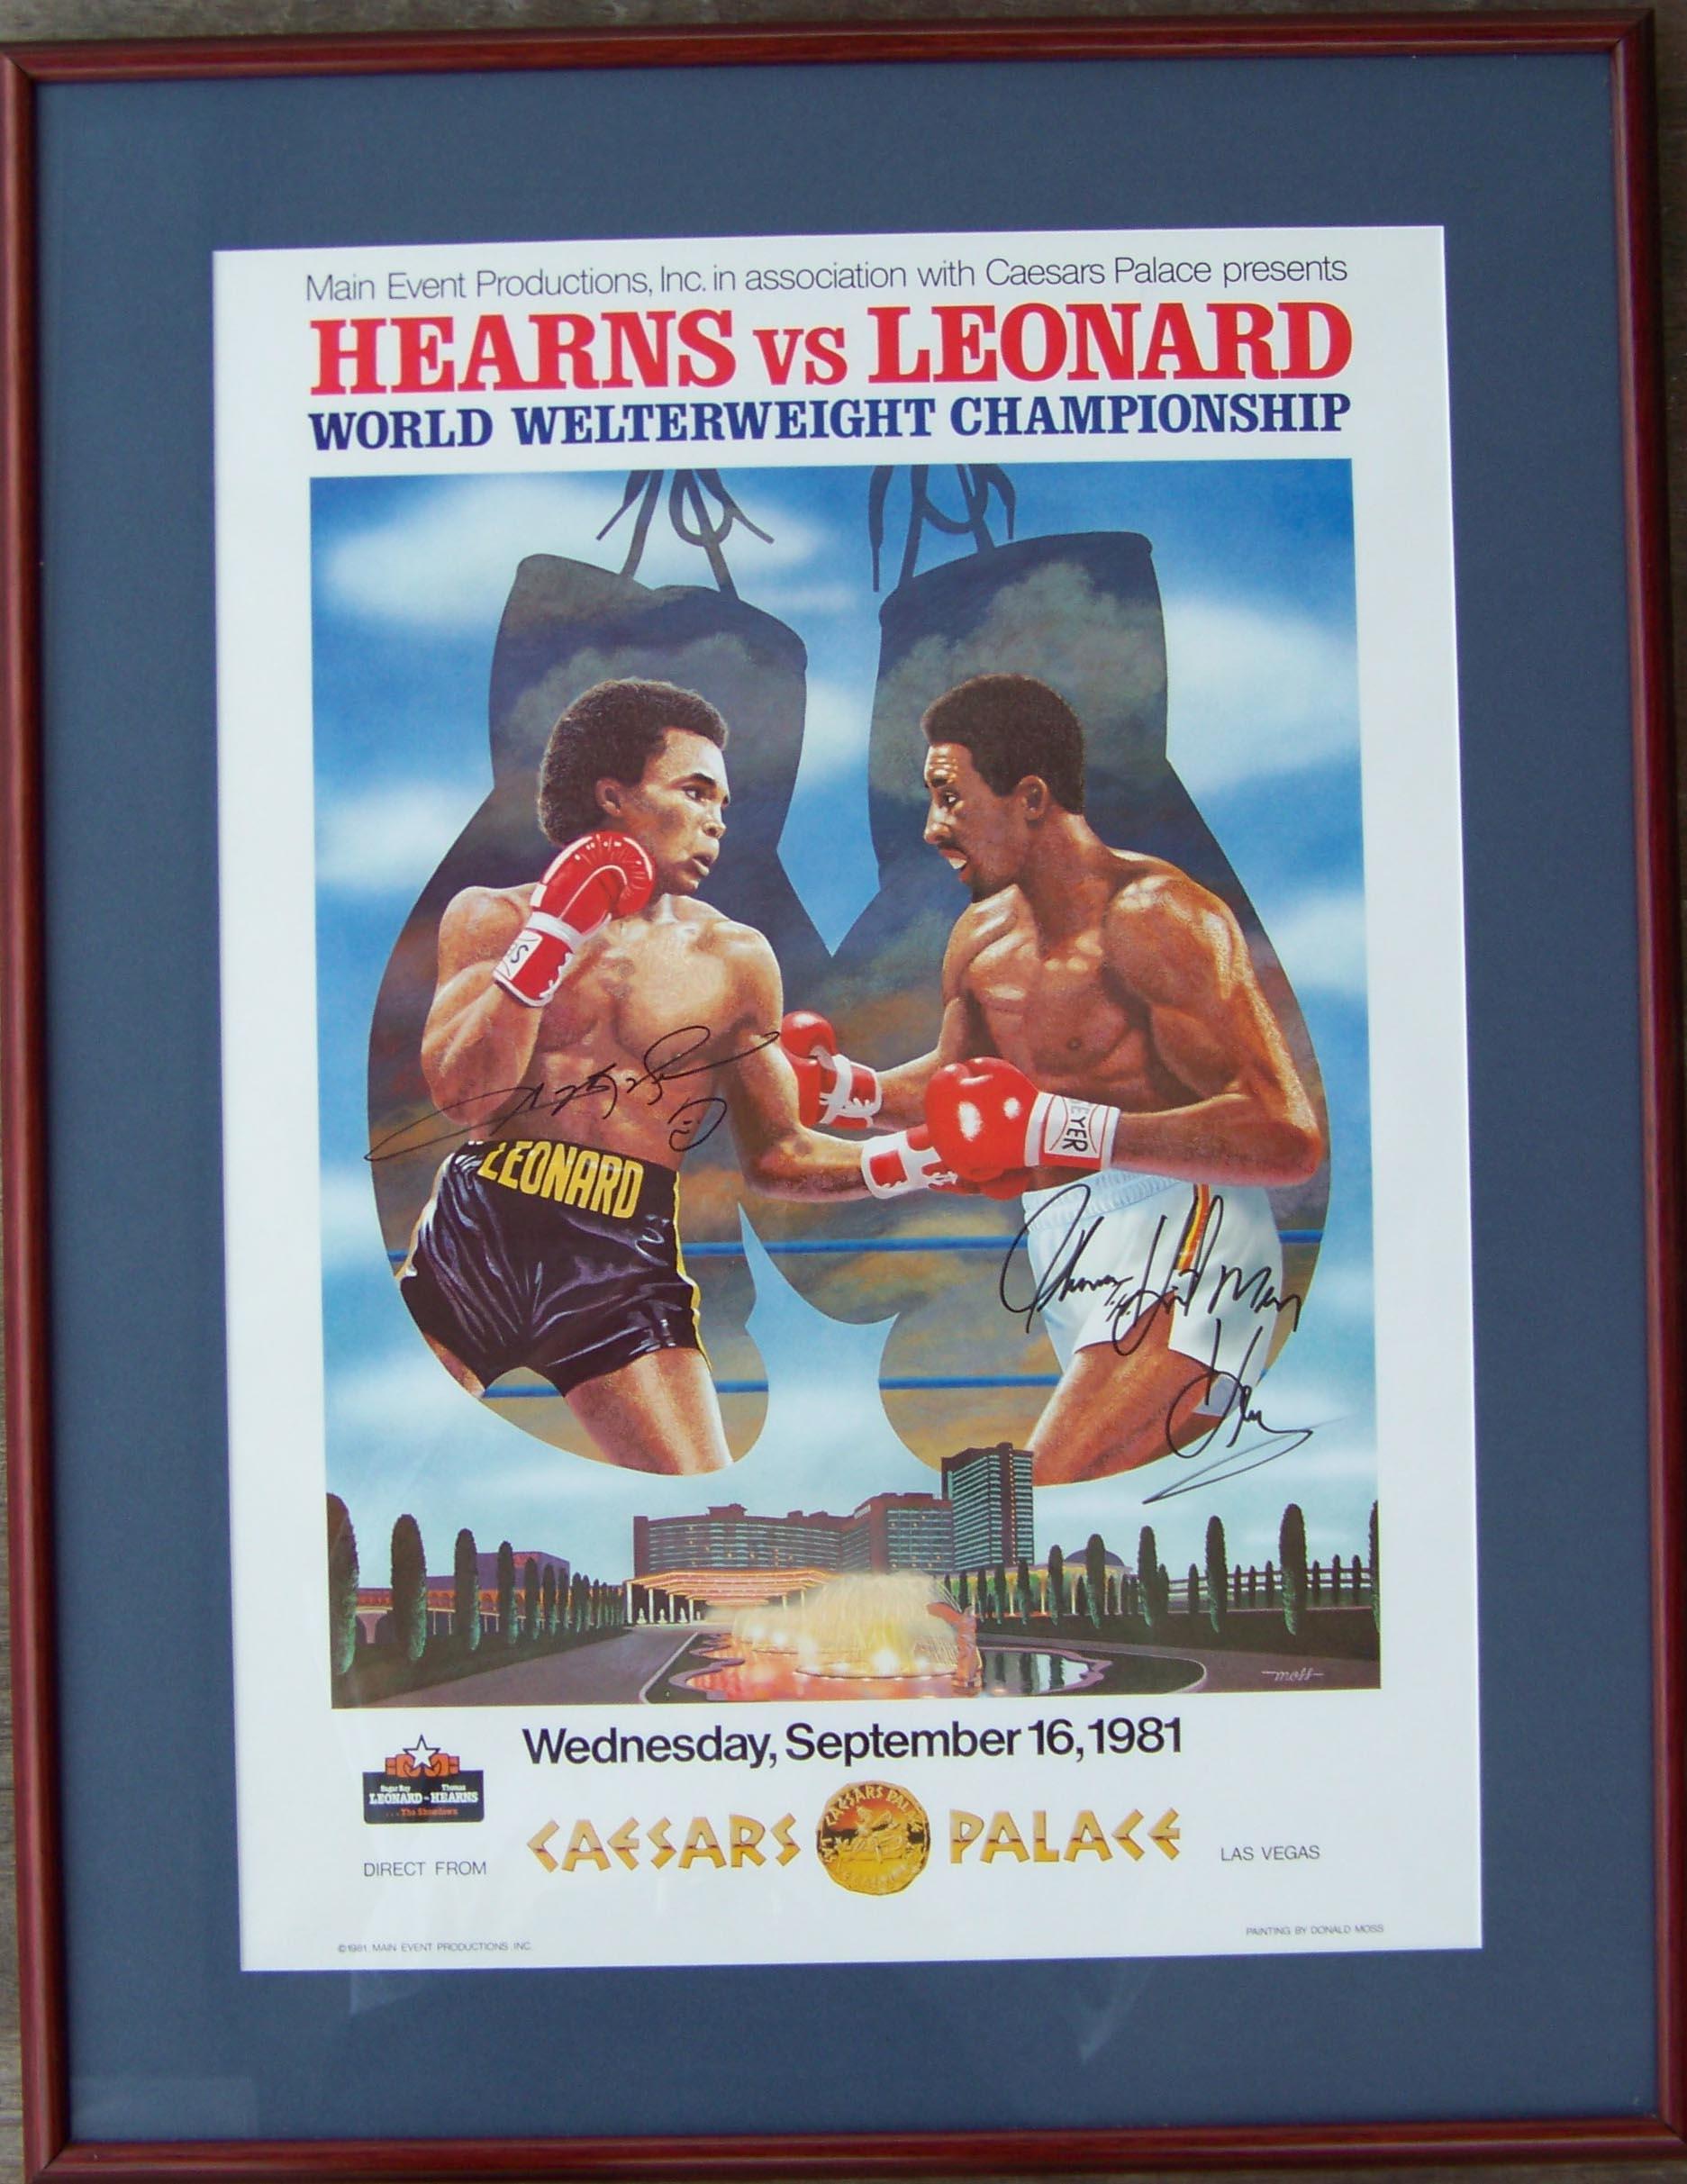 Leonard-Hearns